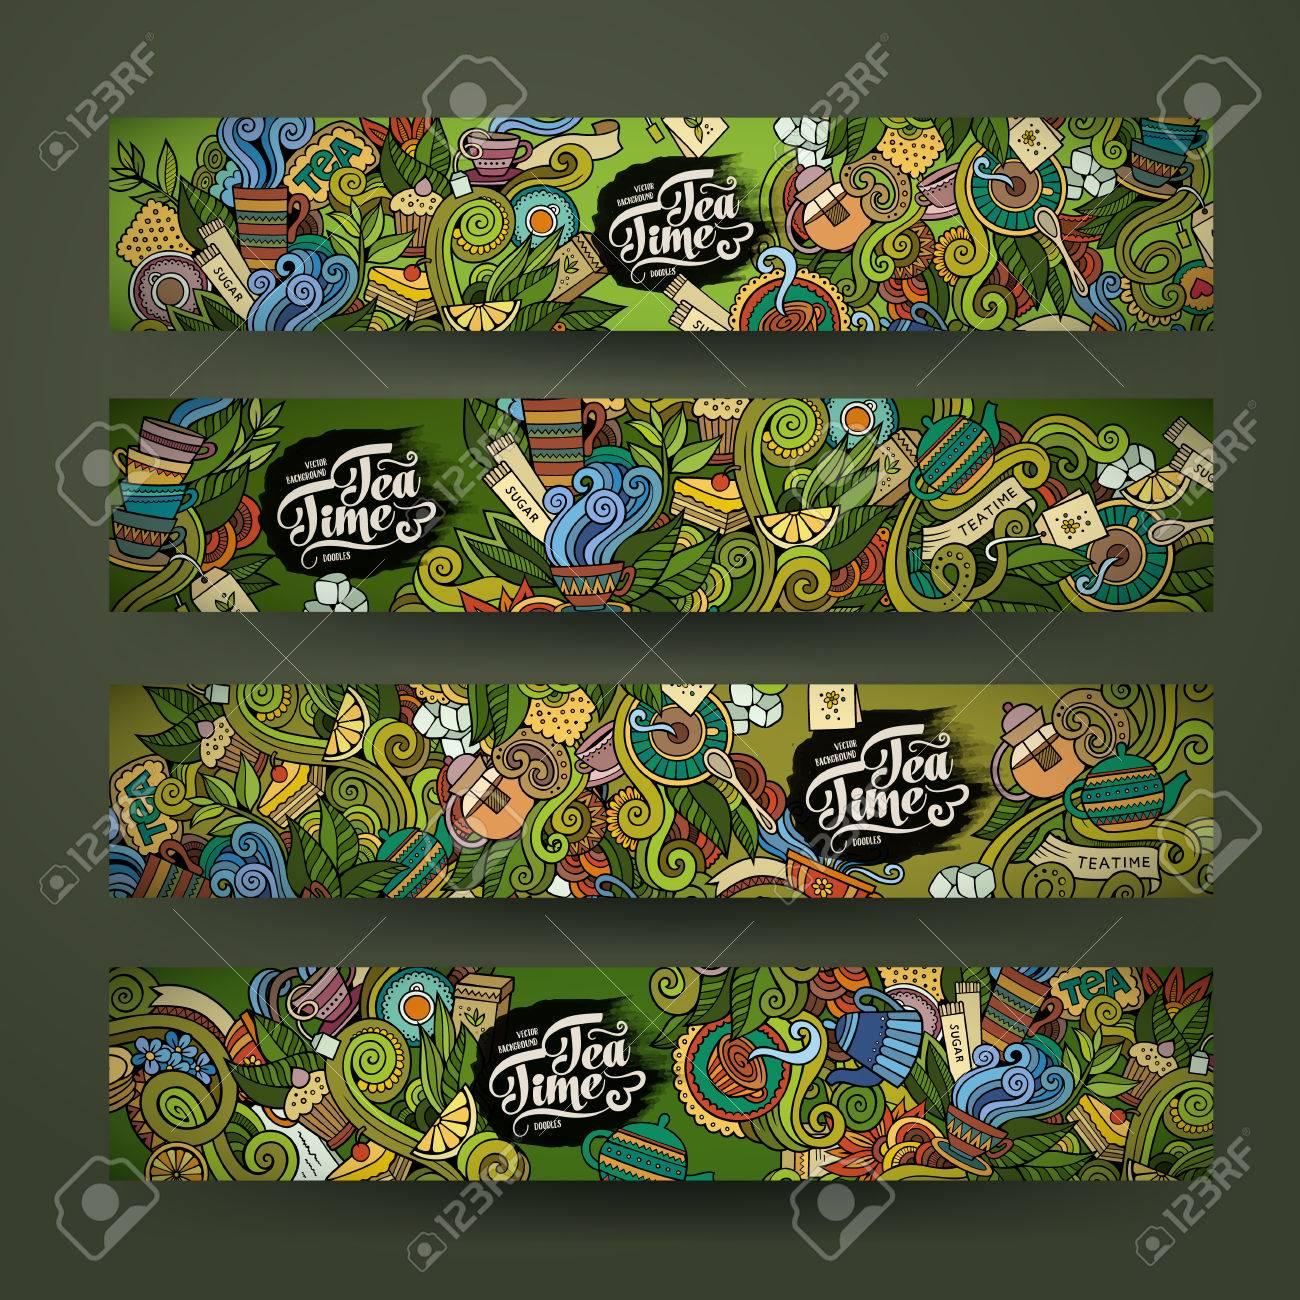 Vector doodles tea time design banner templates set - 42896551